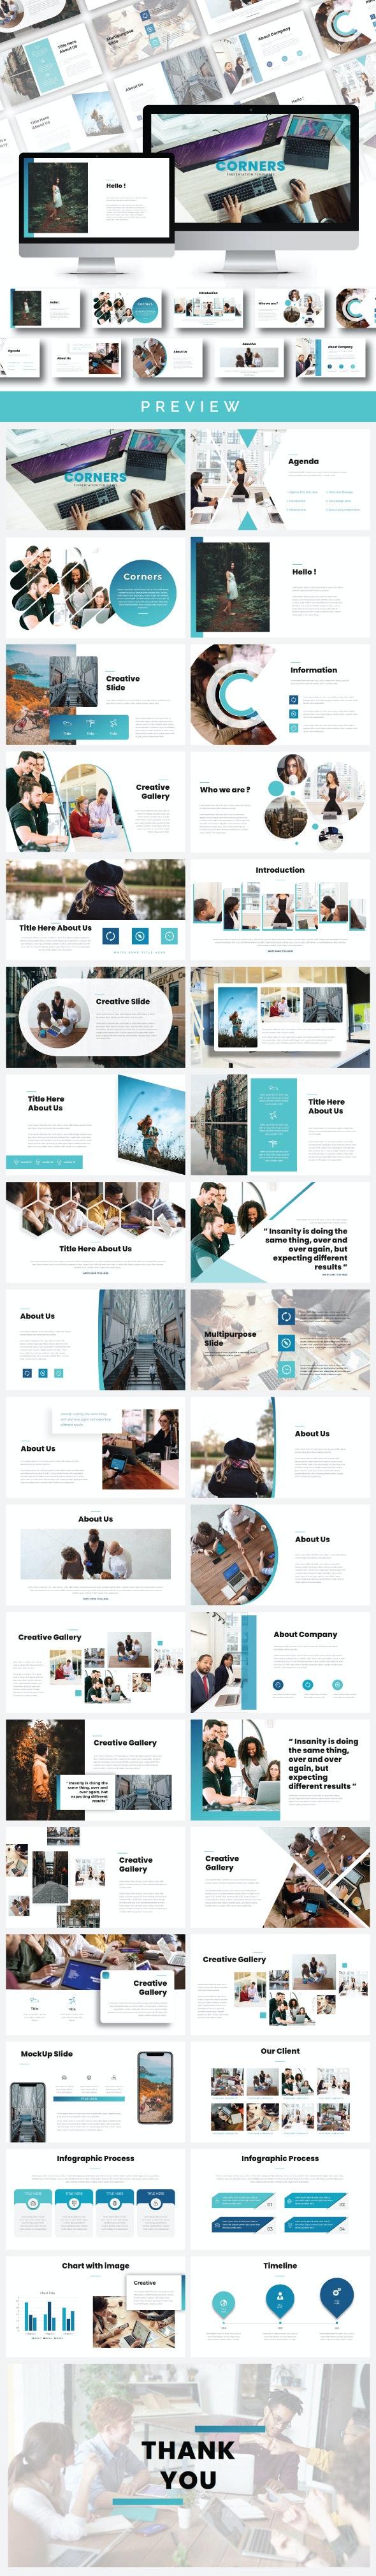 Corners Multipurpose PowerPoint Template - Creative PowerPoint Templates